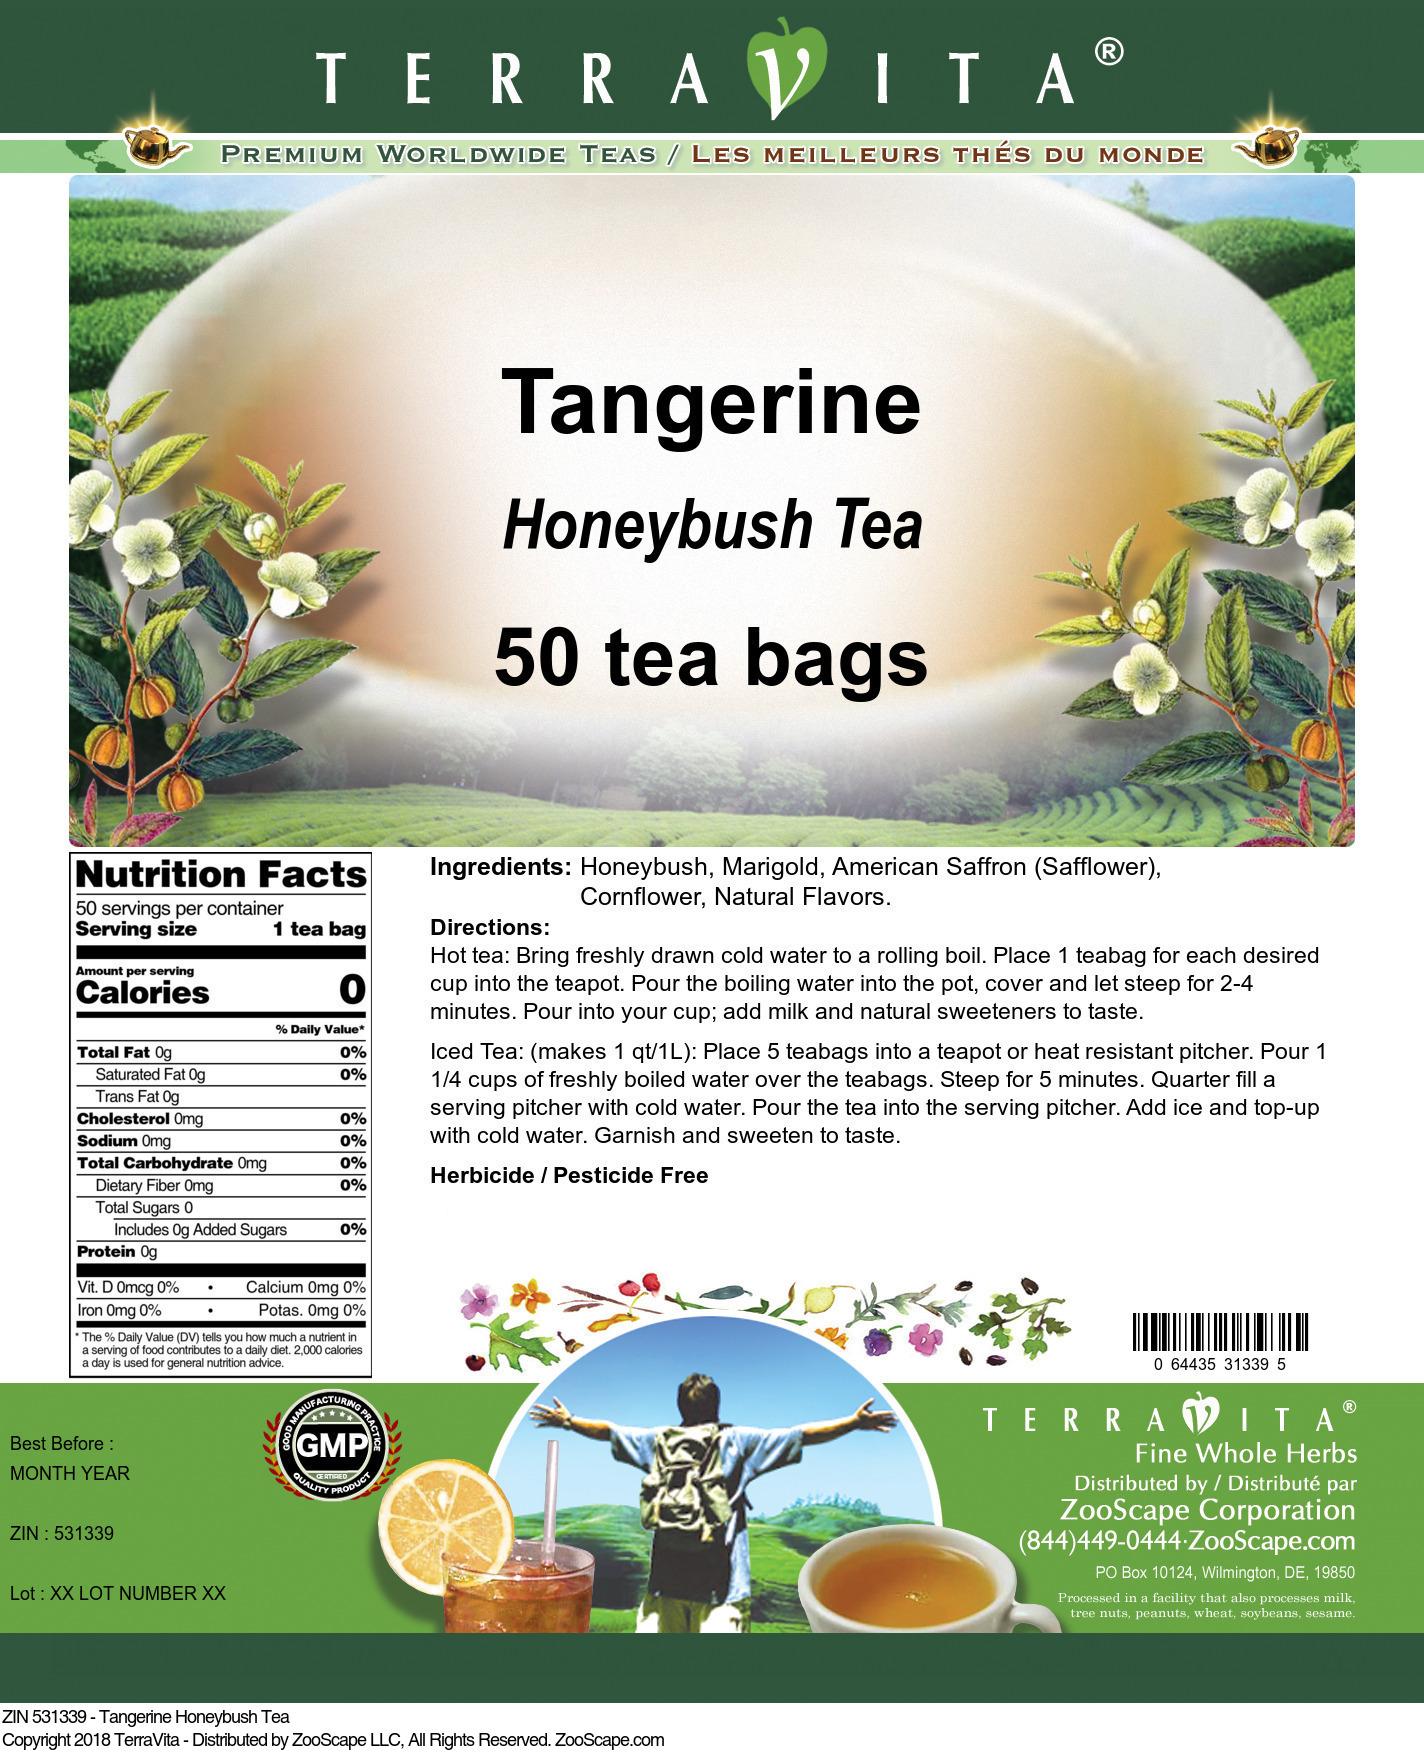 Tangerine Honeybush Tea